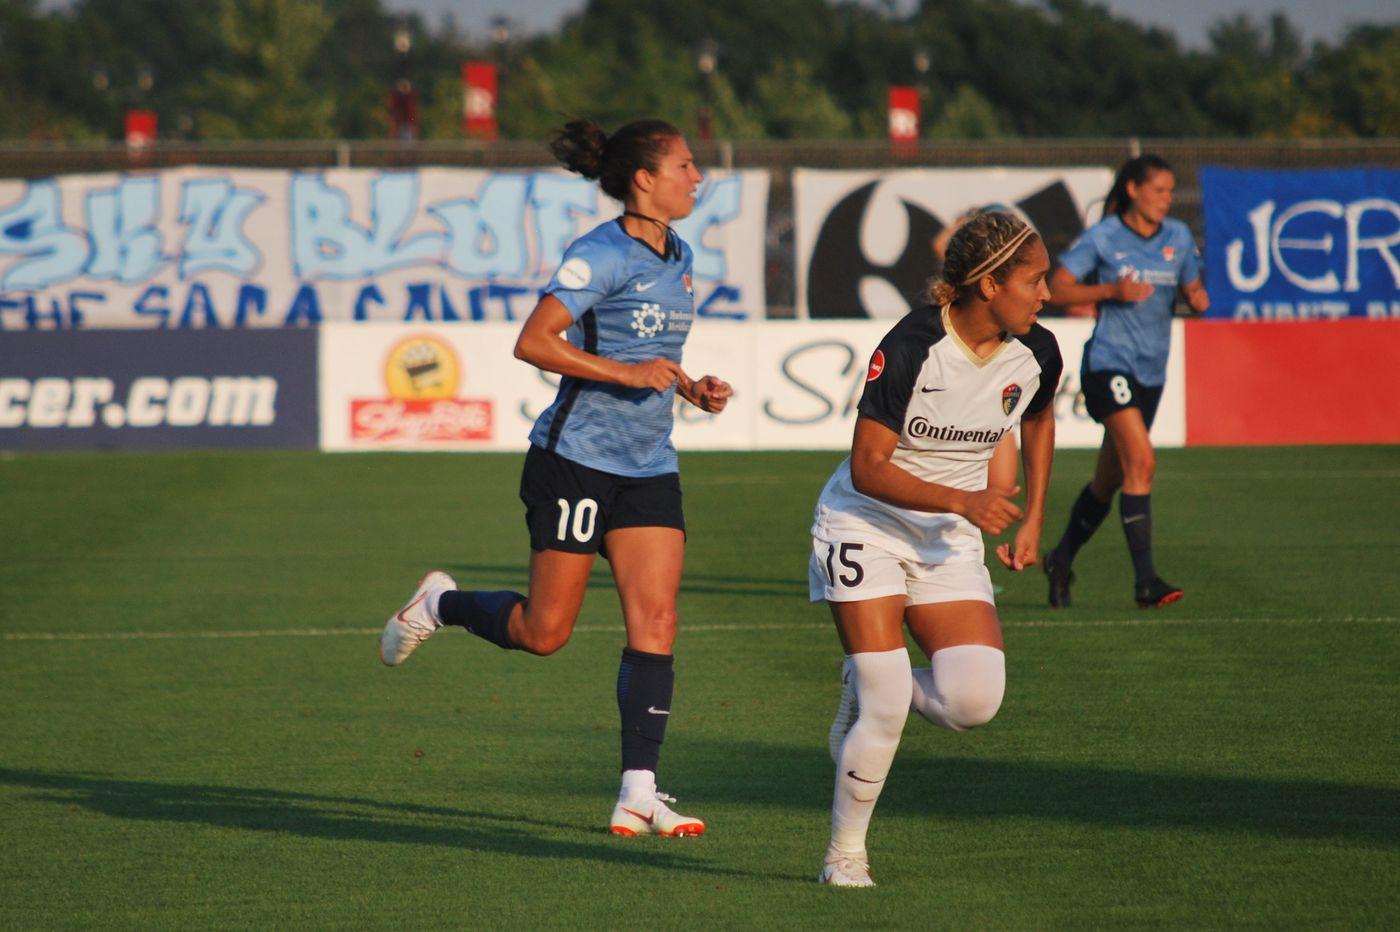 u.s. women's soccer team takes over the spotlight with women's world